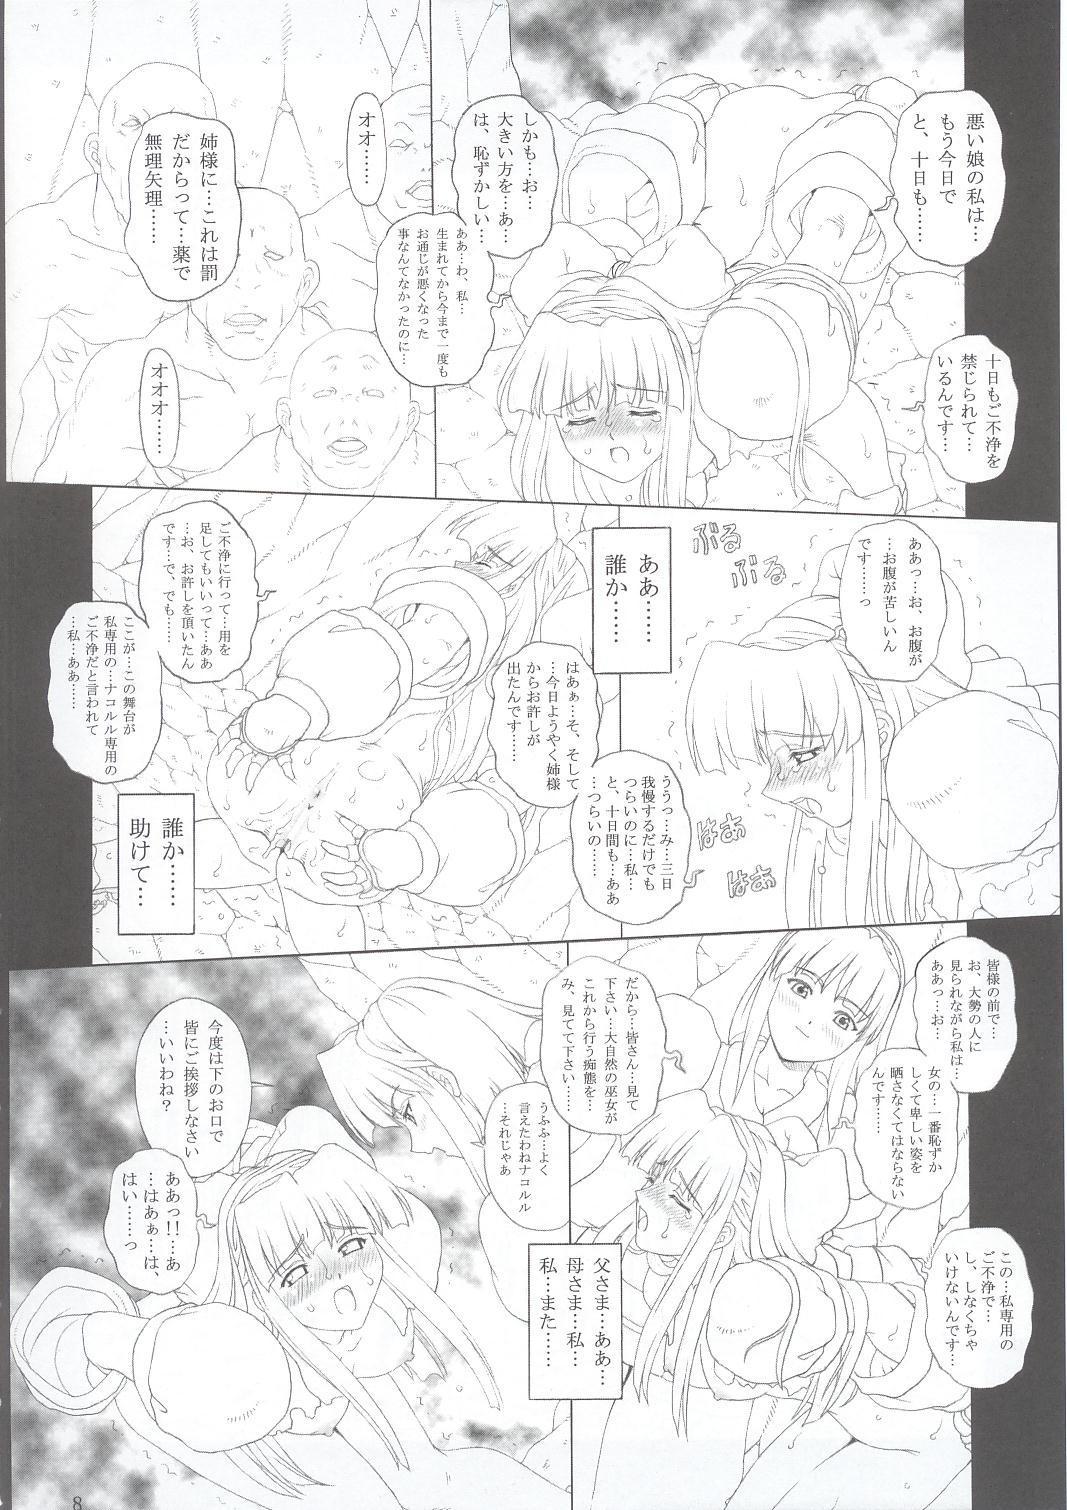 JUNK Dain no Miko San 6